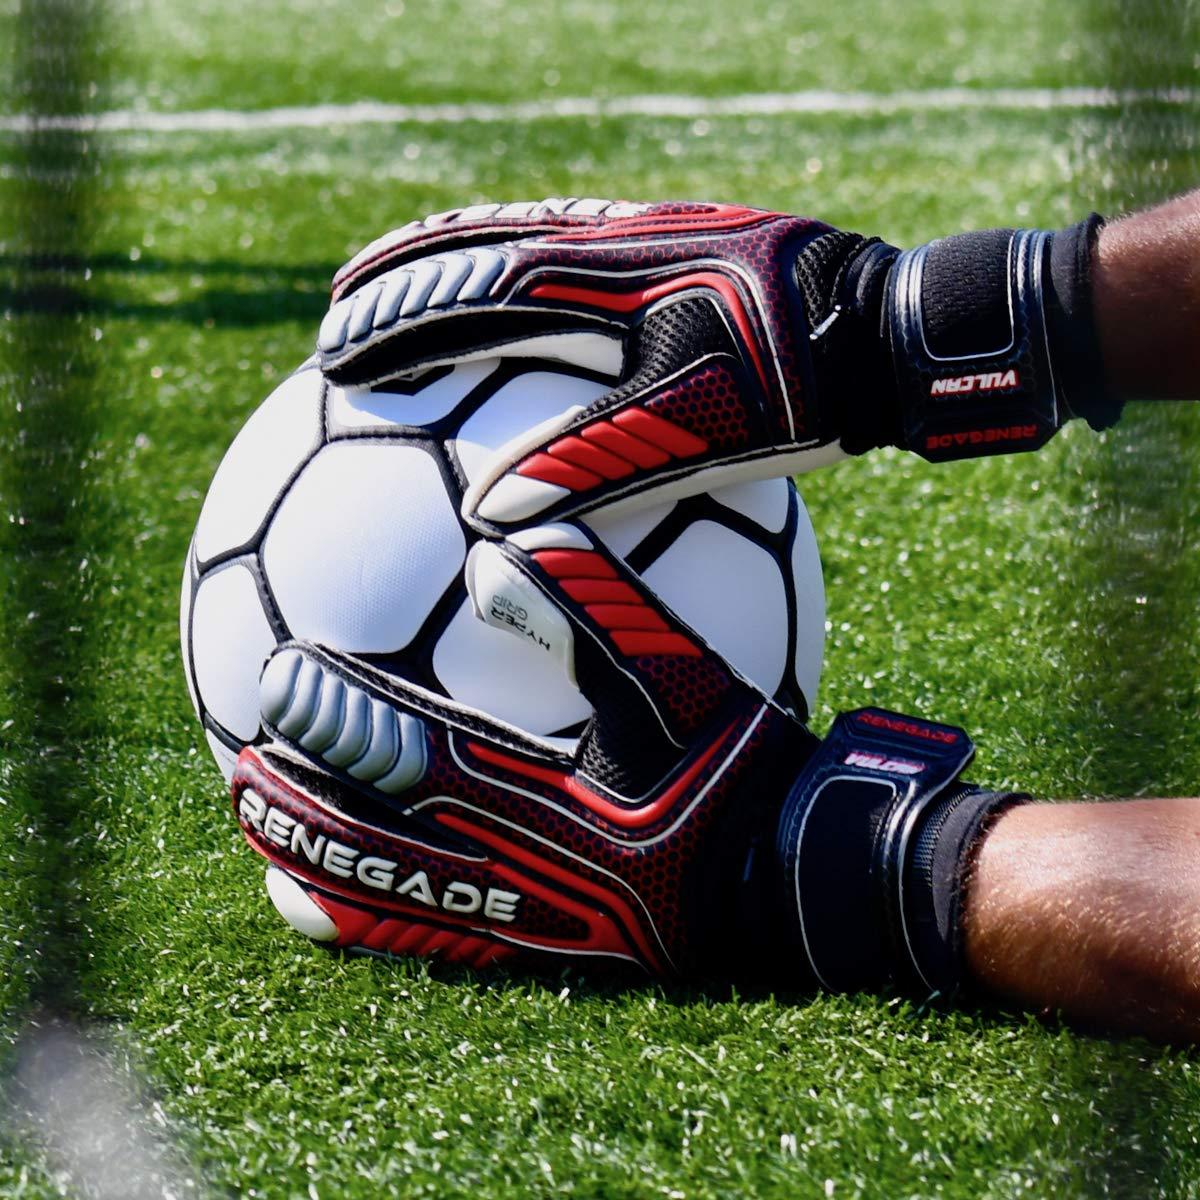 Renegade GK Vulcan Goalie Gloves Pro-Tek Fingersaves Excellent All-Around Goalkeeper Glove for Higher Level Play Sizes 6-11, 3 Cuts, Lvl 3 German Hyper Grip Palms 30 Day Guar.